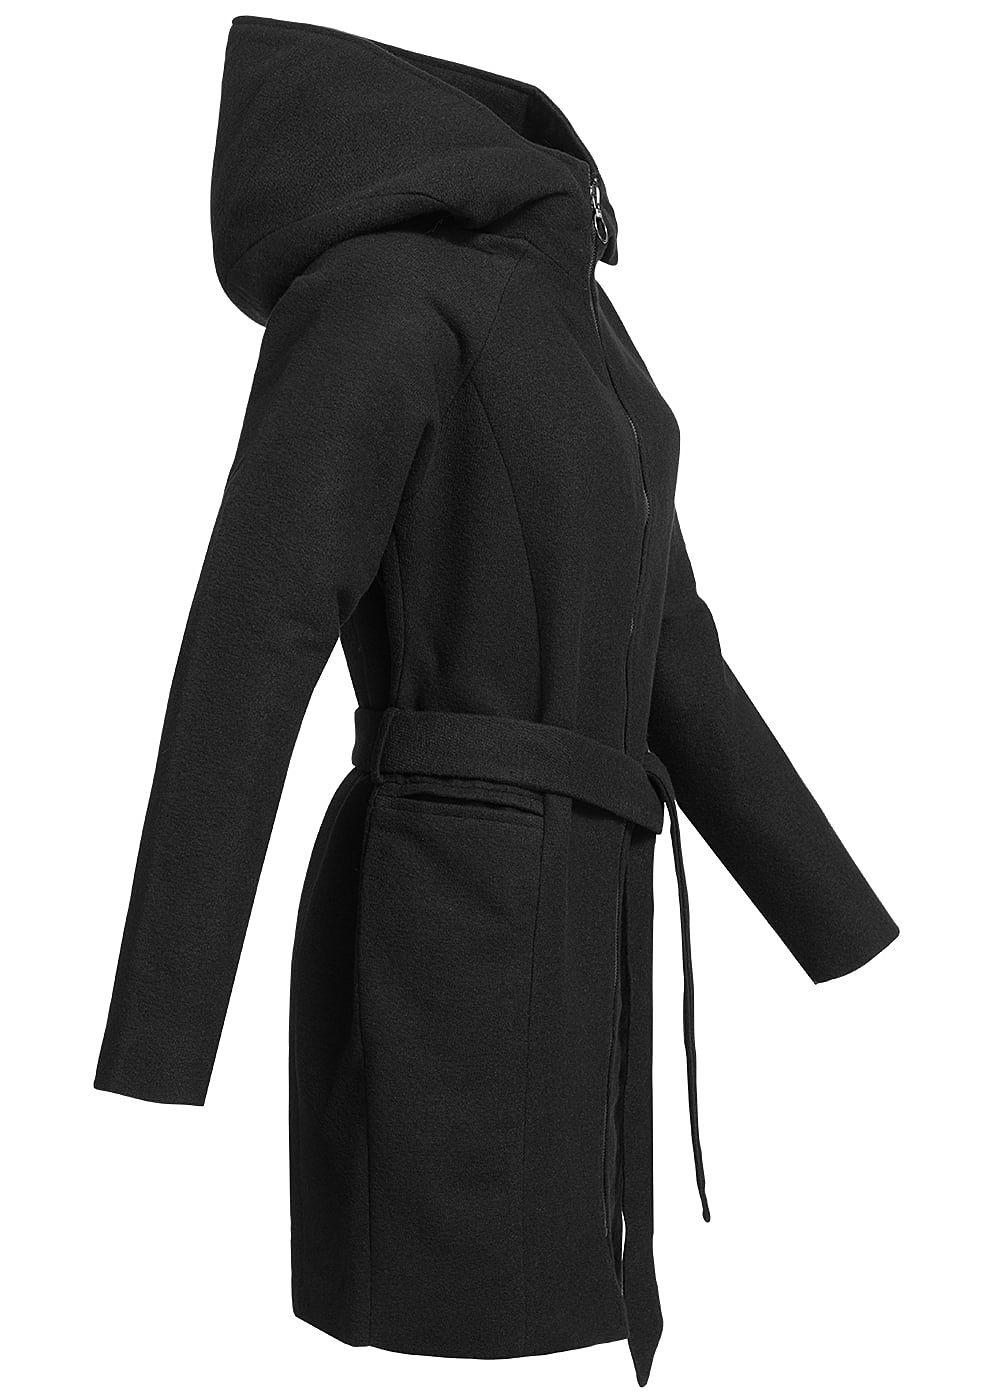 only damen bergangs mantel grosse kapuze 2 taschen bindeg rtel schwarz 77onlineshop. Black Bedroom Furniture Sets. Home Design Ideas